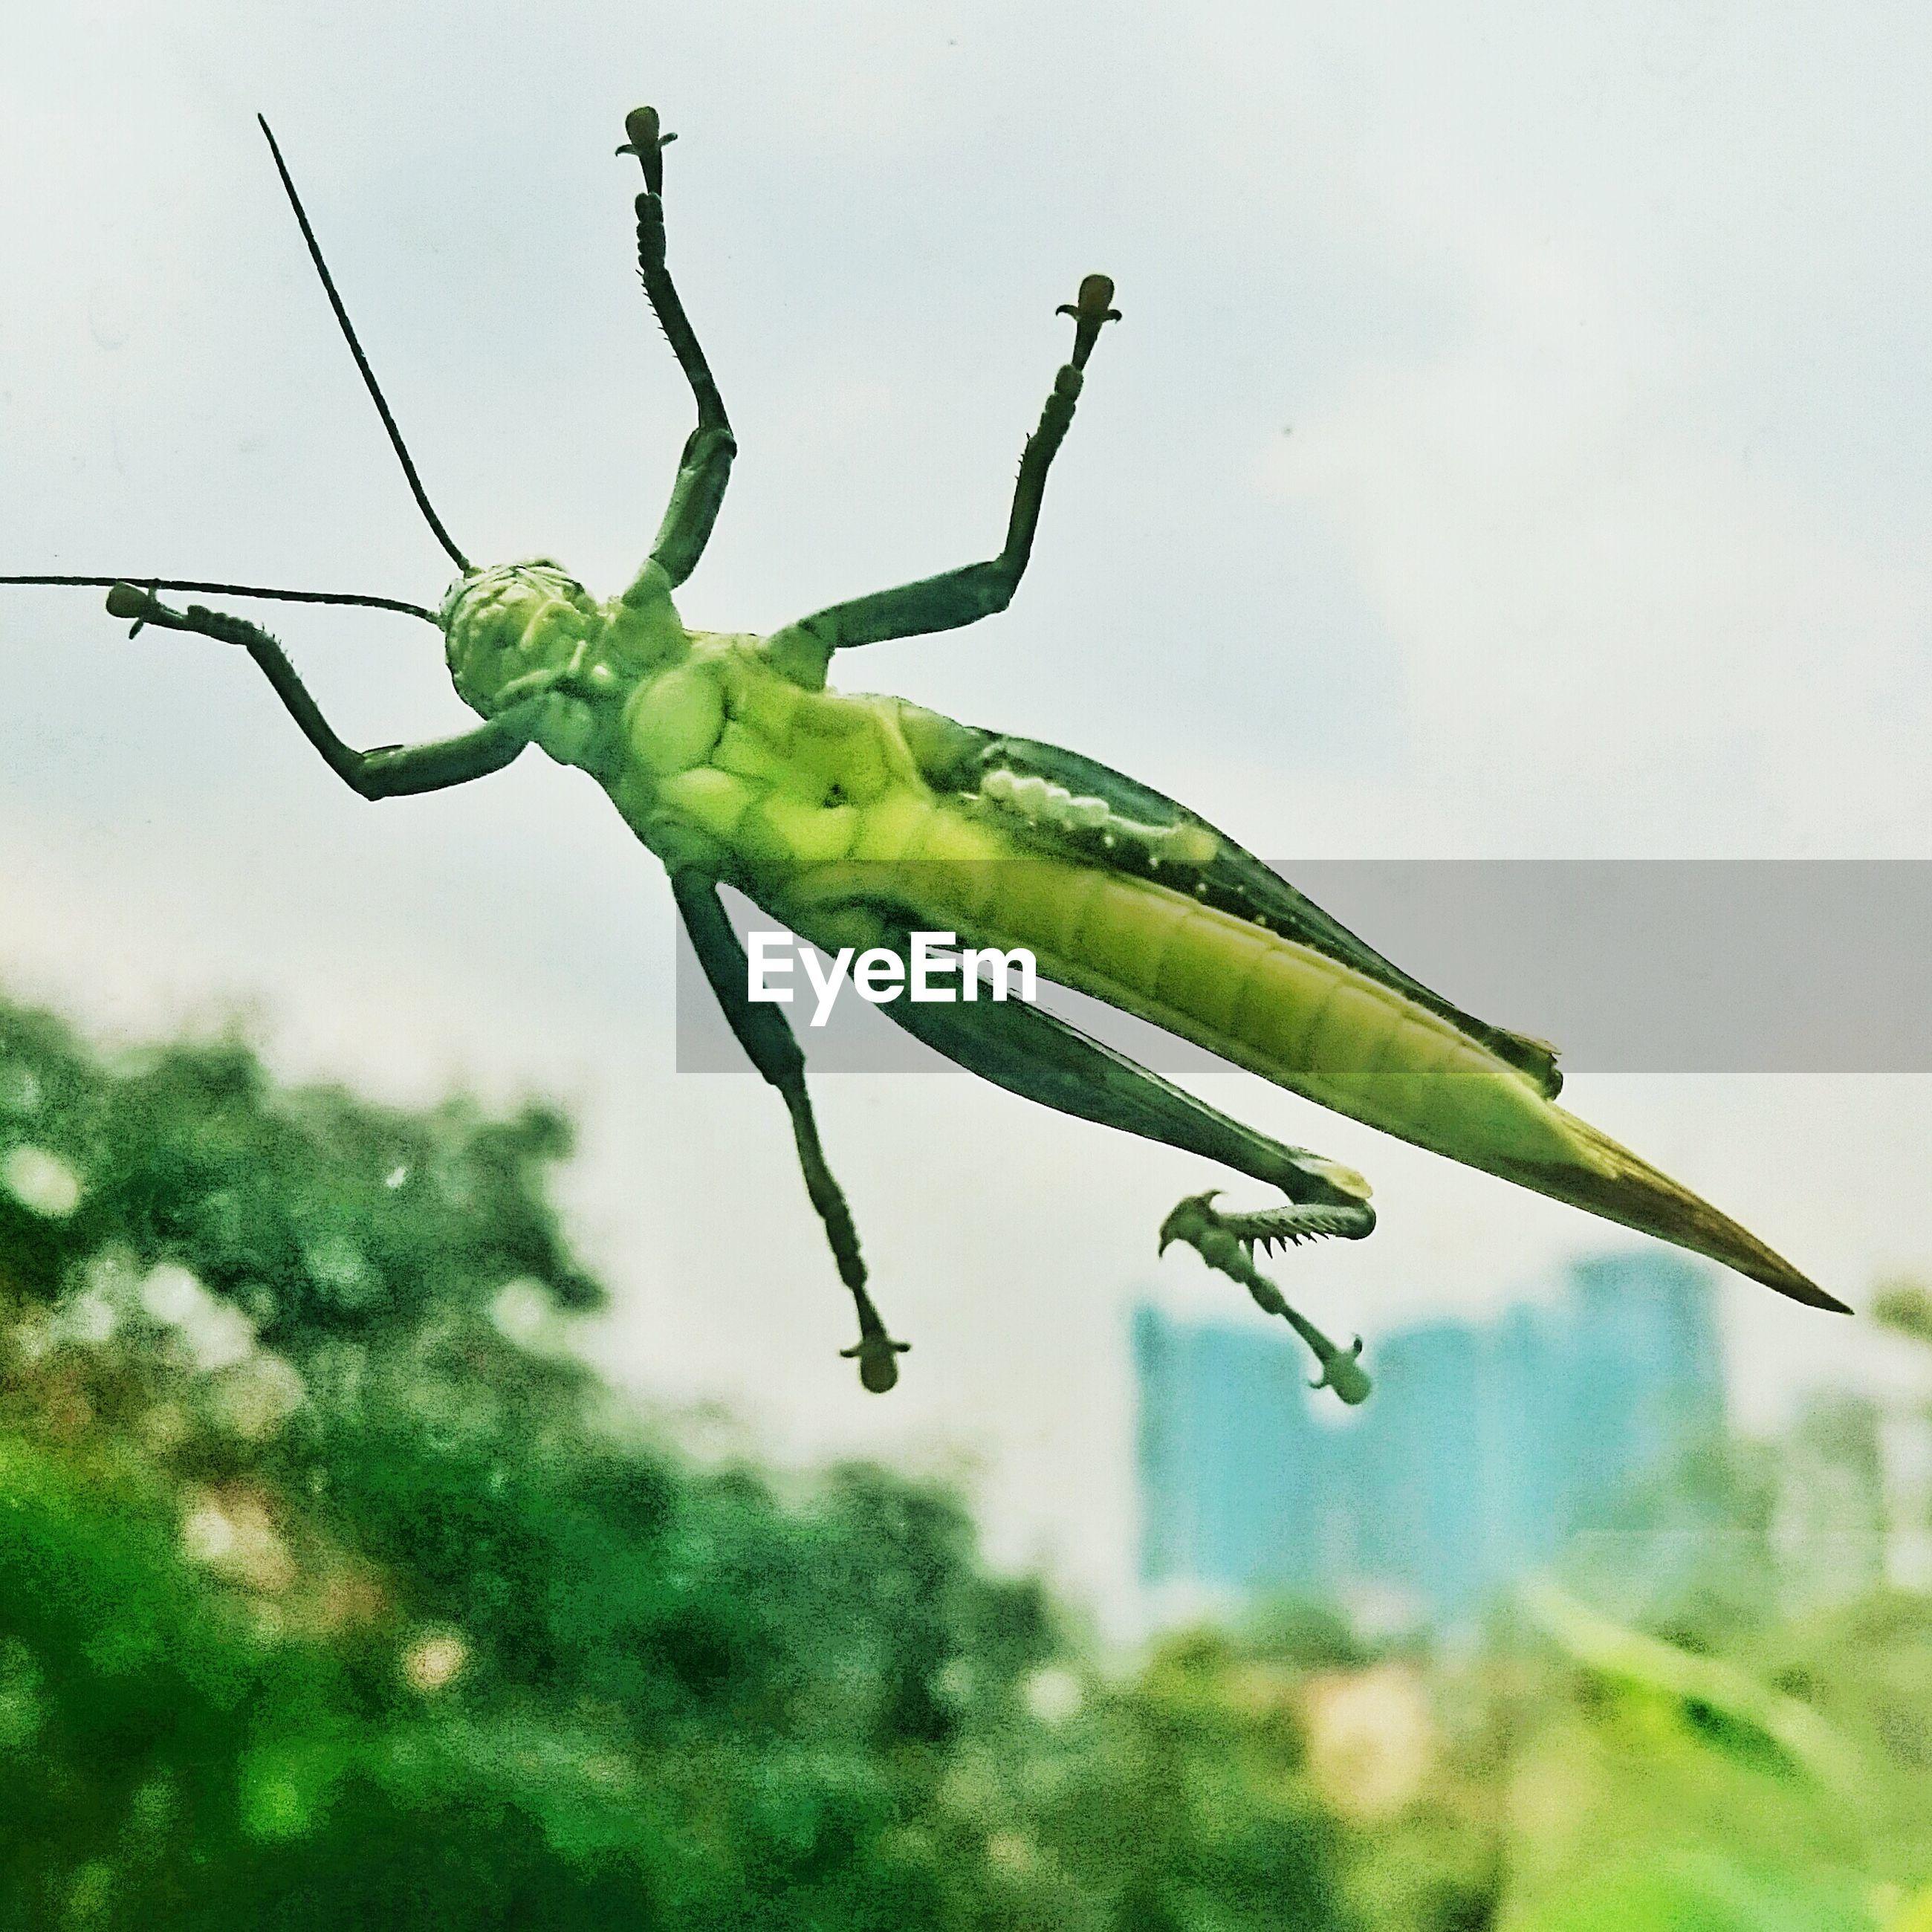 Grasshopper on window